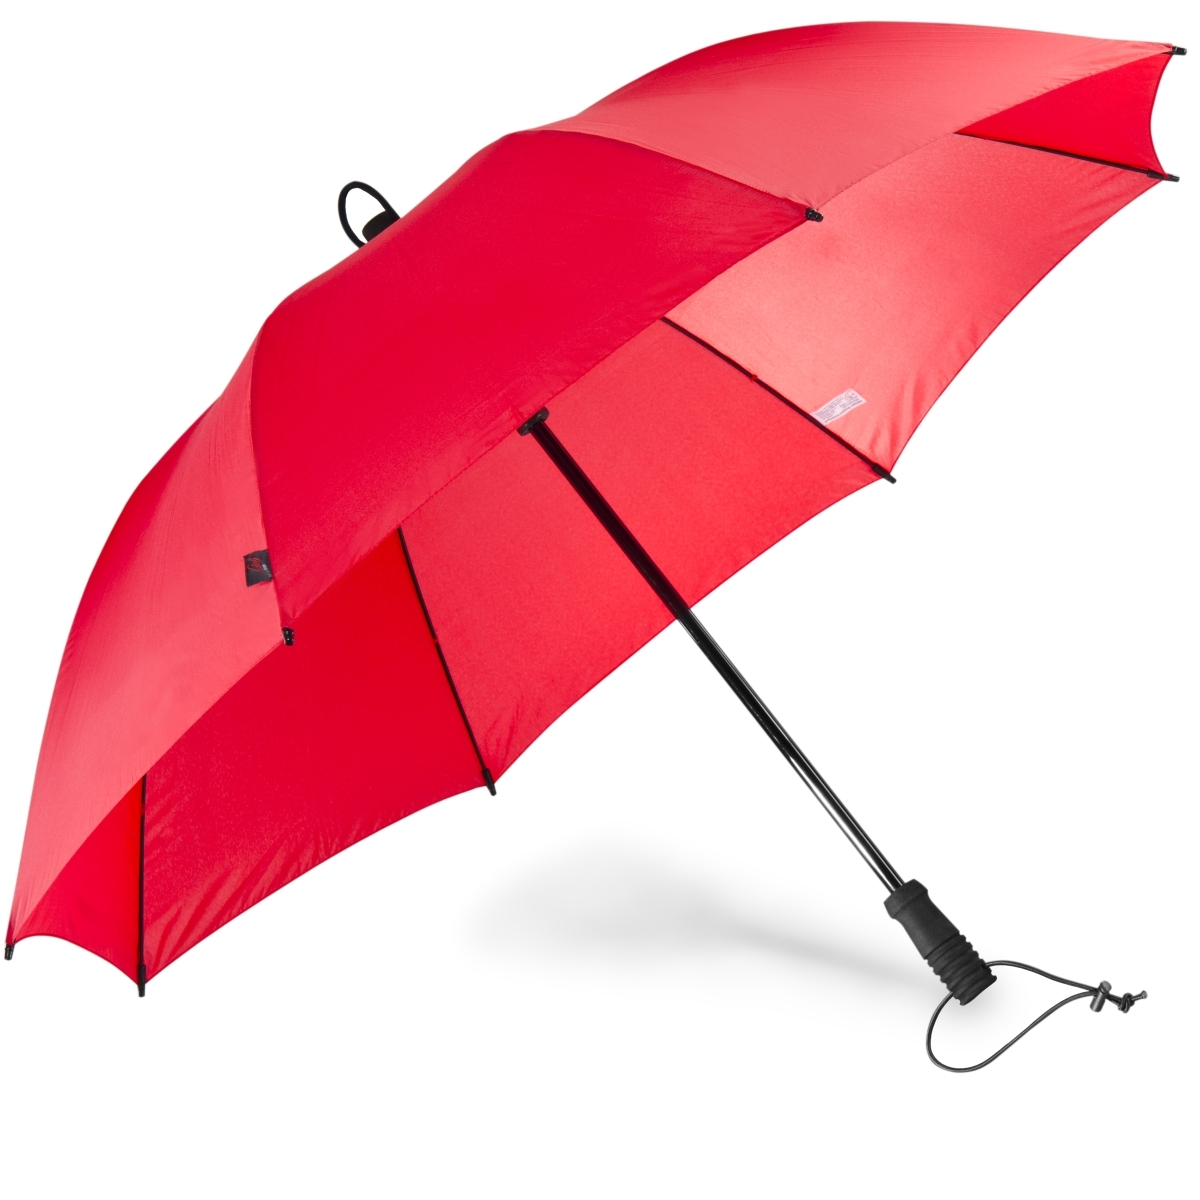 Swing handsfree Umbrella red